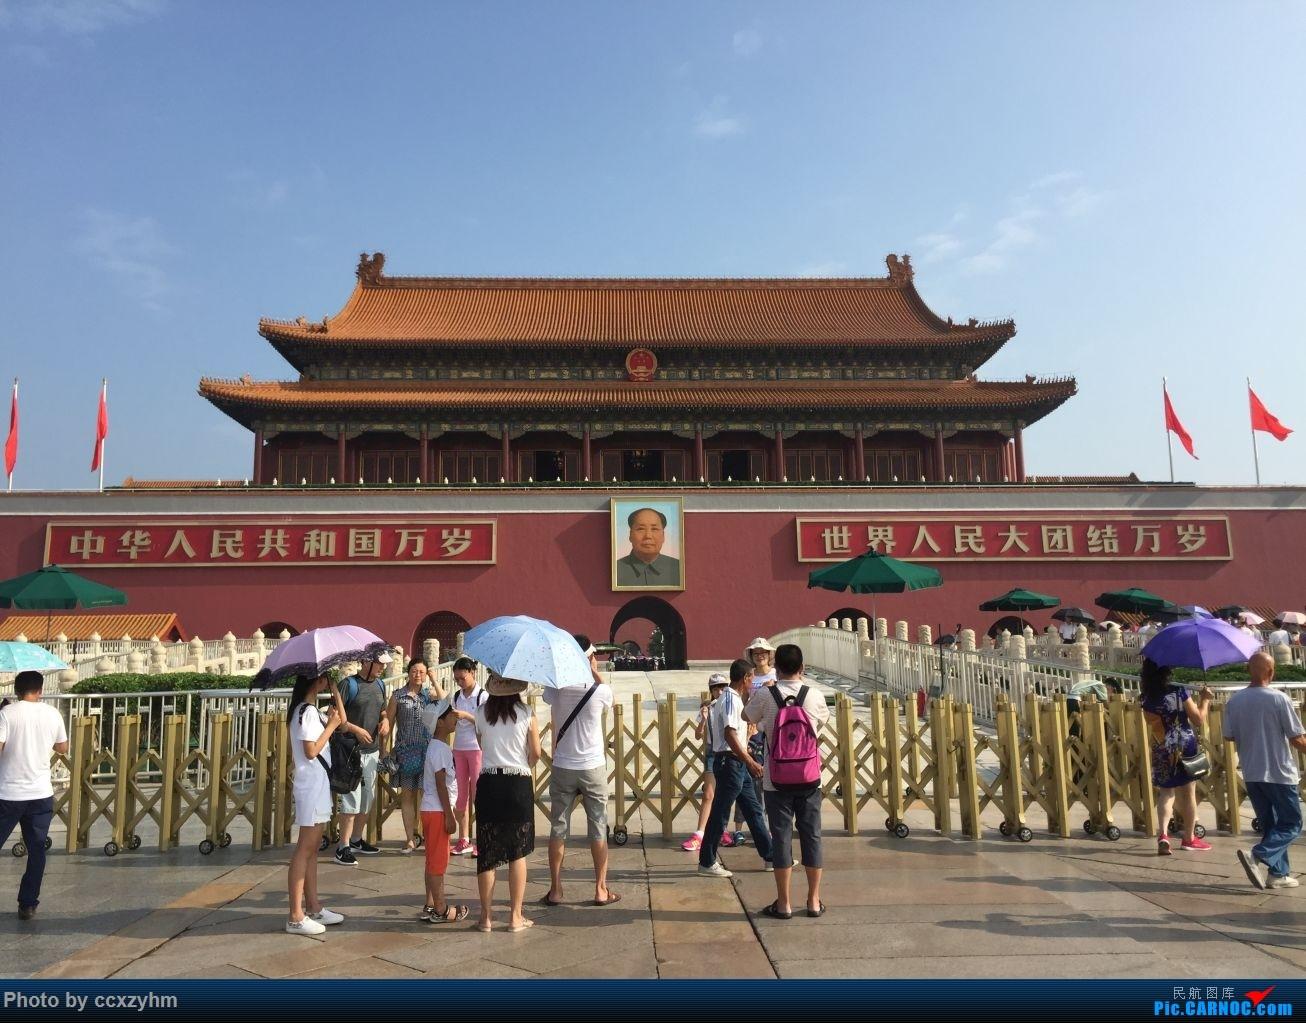 Re:[原创]论坛首发 京沪线上的国航789 高二升高三暑假短Break 空铁联运去北京